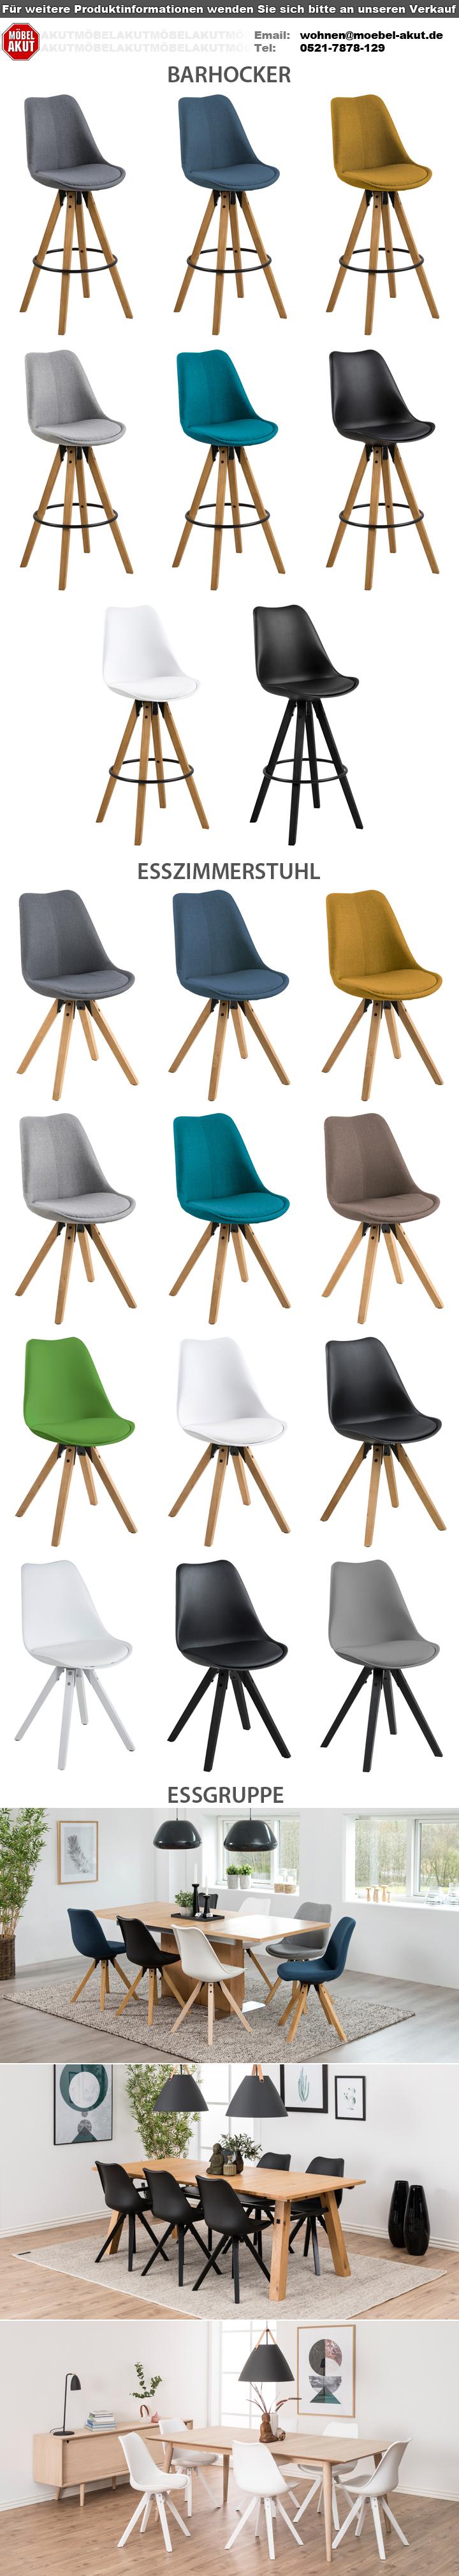 stuhl dima 2er set esszimmerstuhl barhocker bezug schwarz wei grau farbauswahl ebay. Black Bedroom Furniture Sets. Home Design Ideas